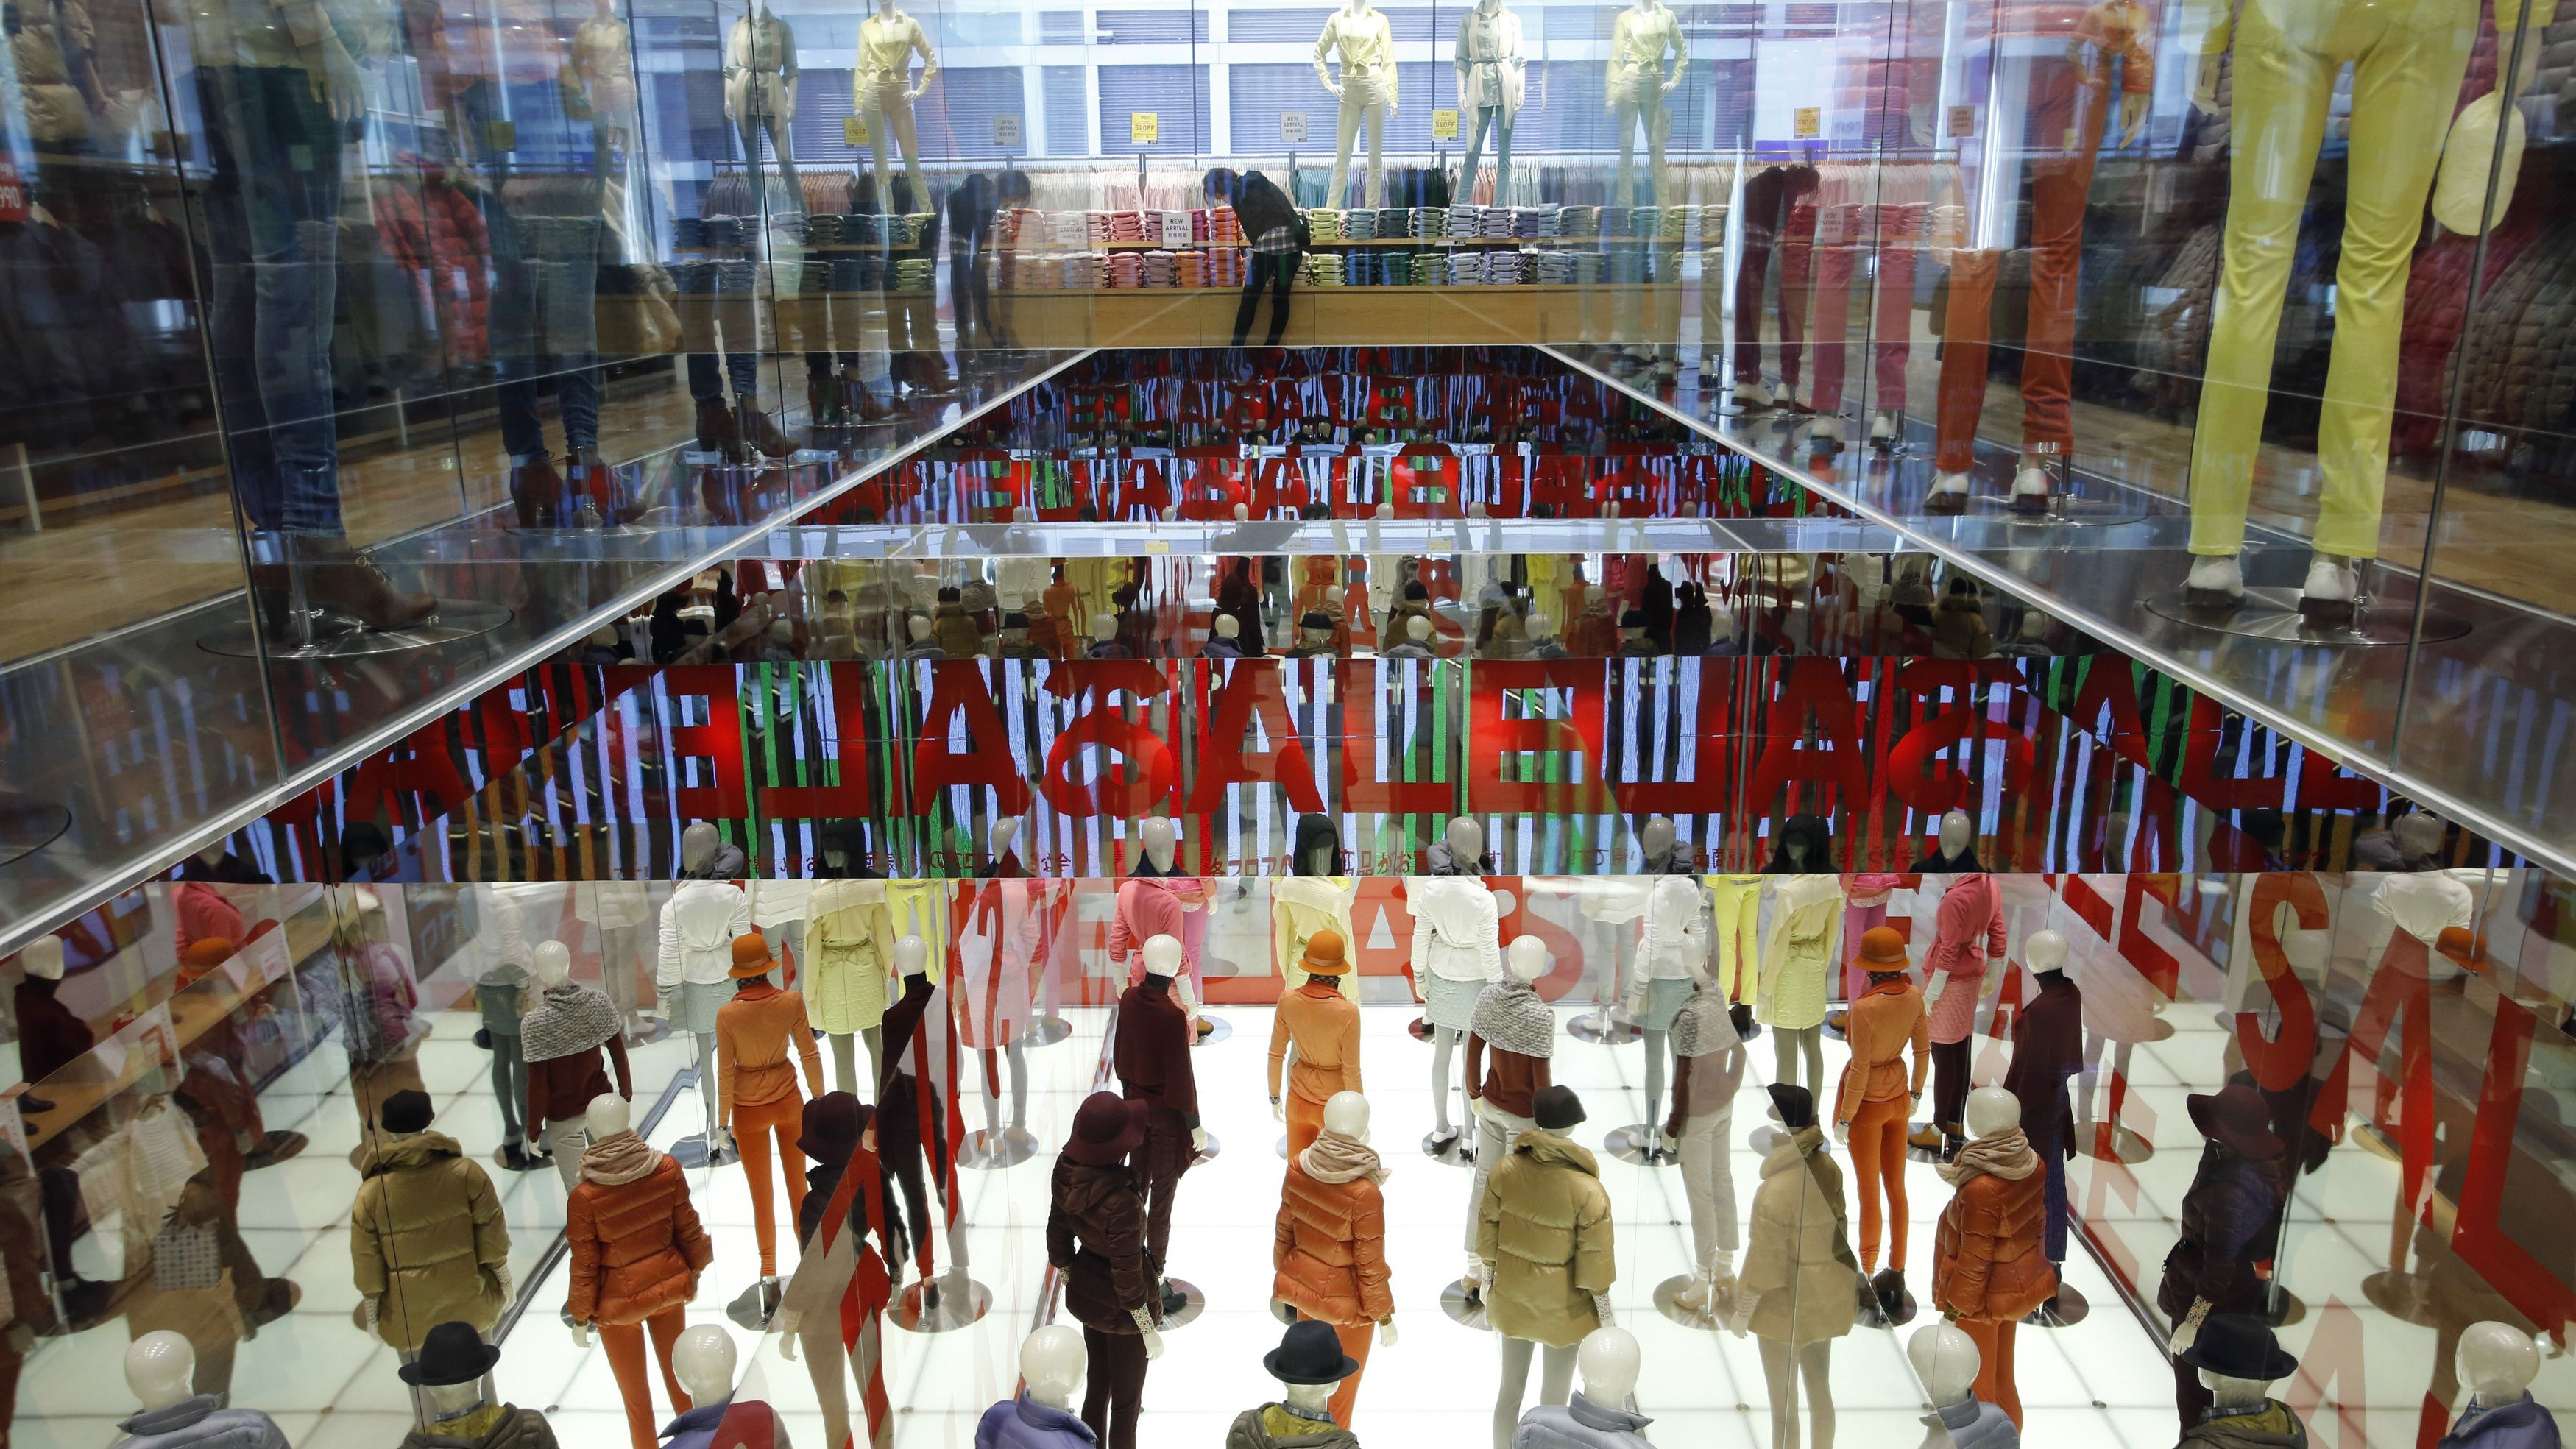 fast fashion, mobile shopping, ecommerce, online shopping, zara, uniqlo, h&m, forever 21, compulsive buying